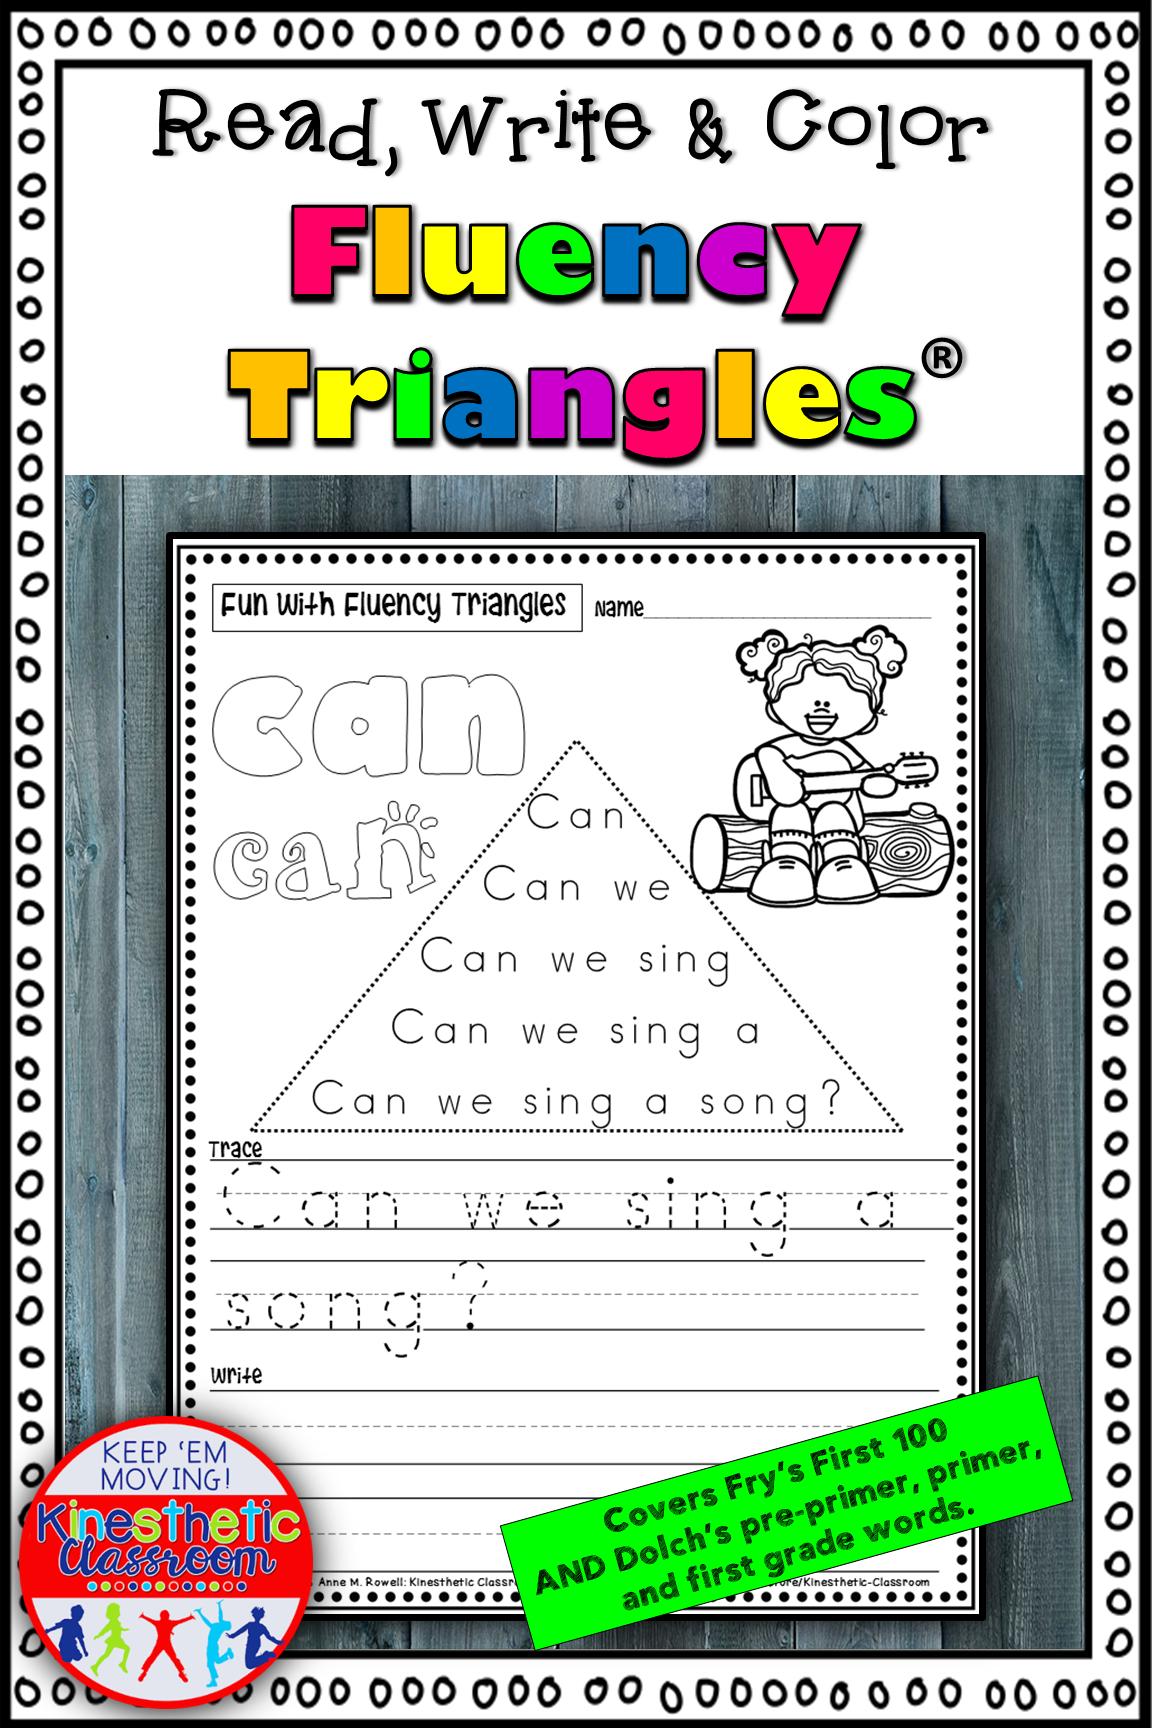 Reading Fluency Triangle Sight Word Activity